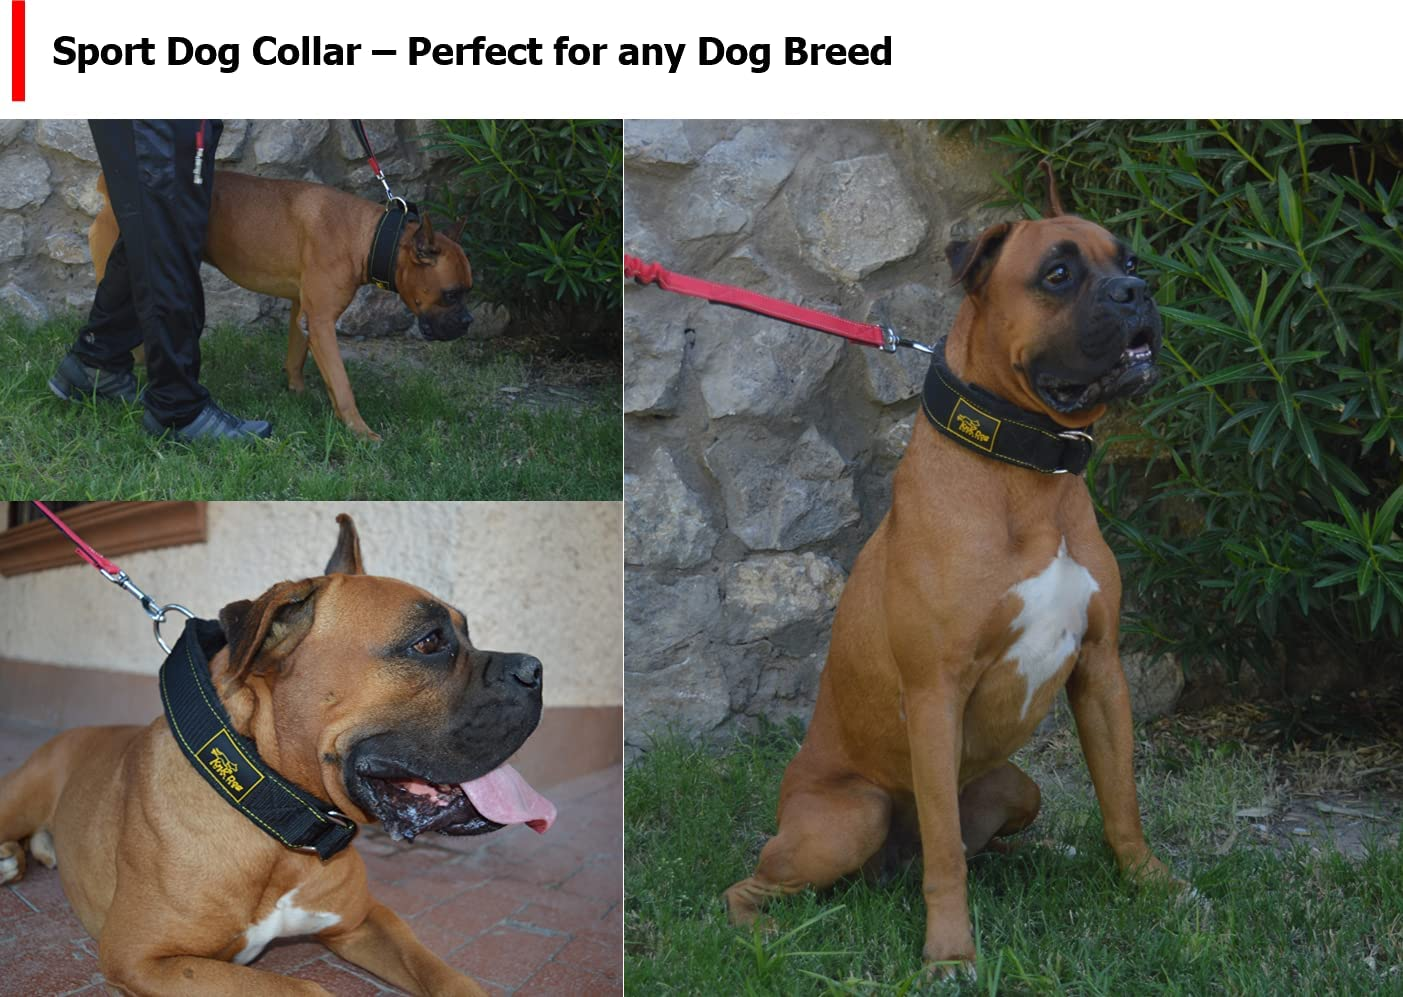 Sport Tactical Dog Collar